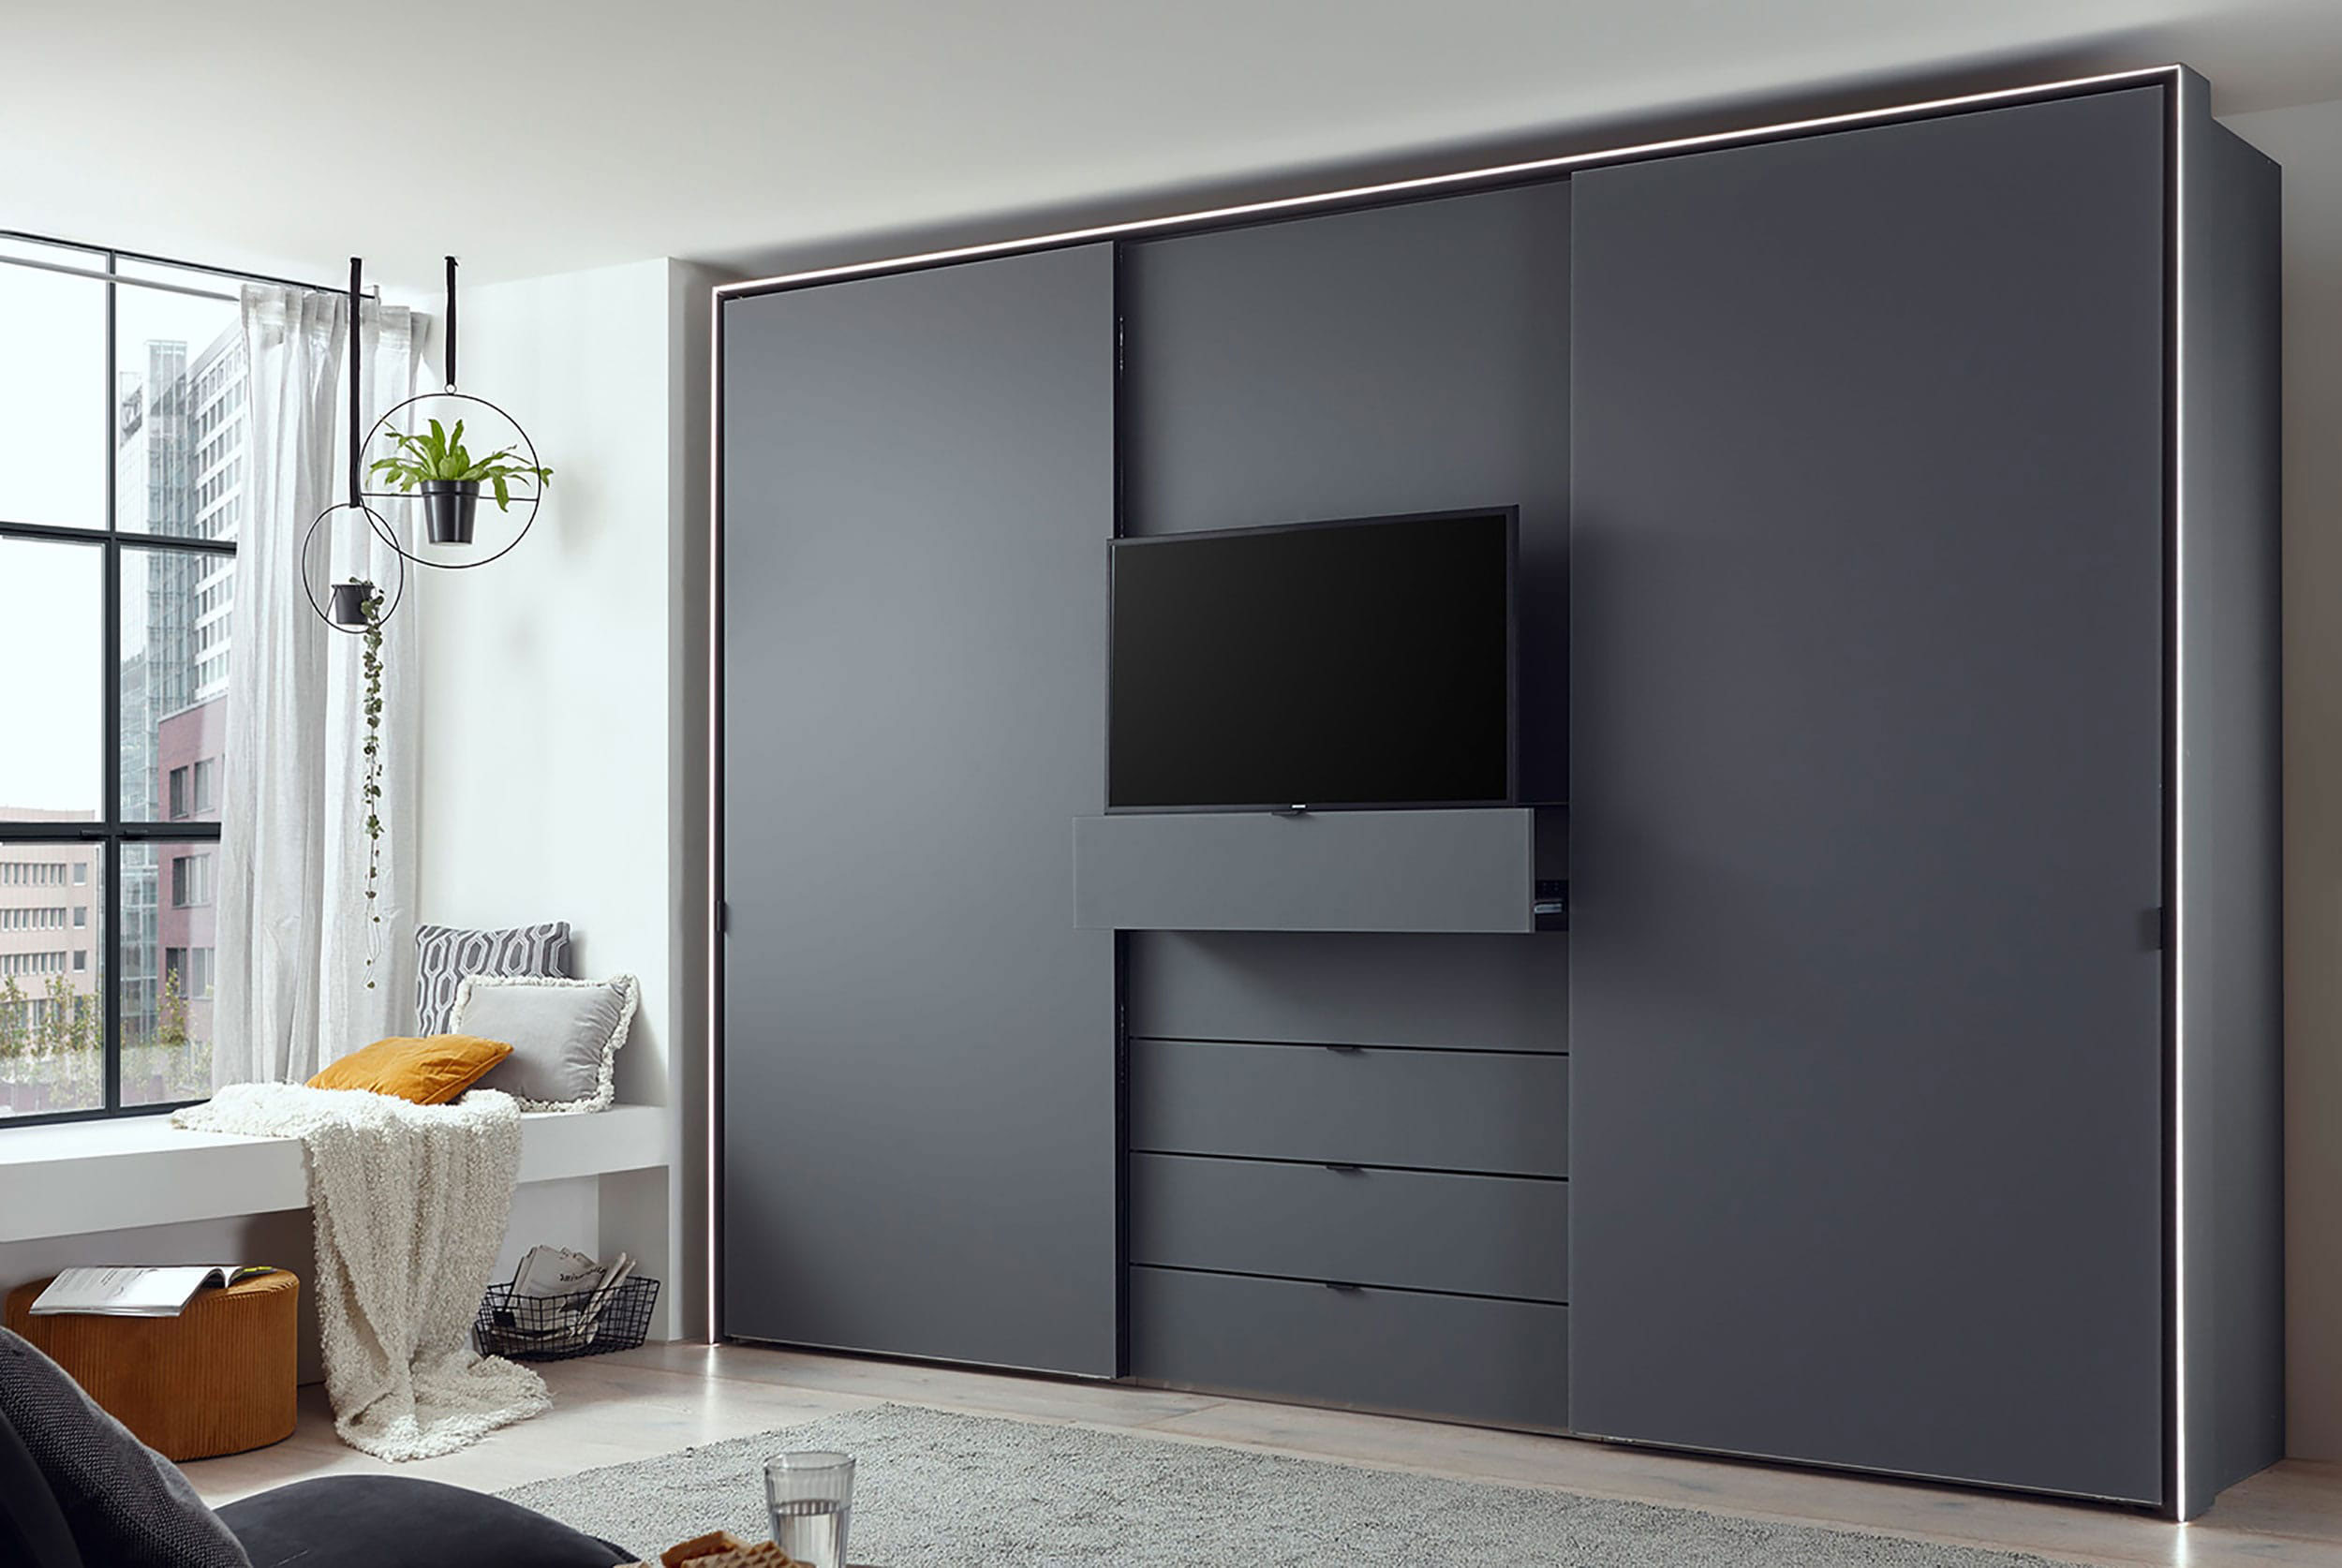 Staud Media Kleiderschrank mit TV Fach Vulkanglas matt